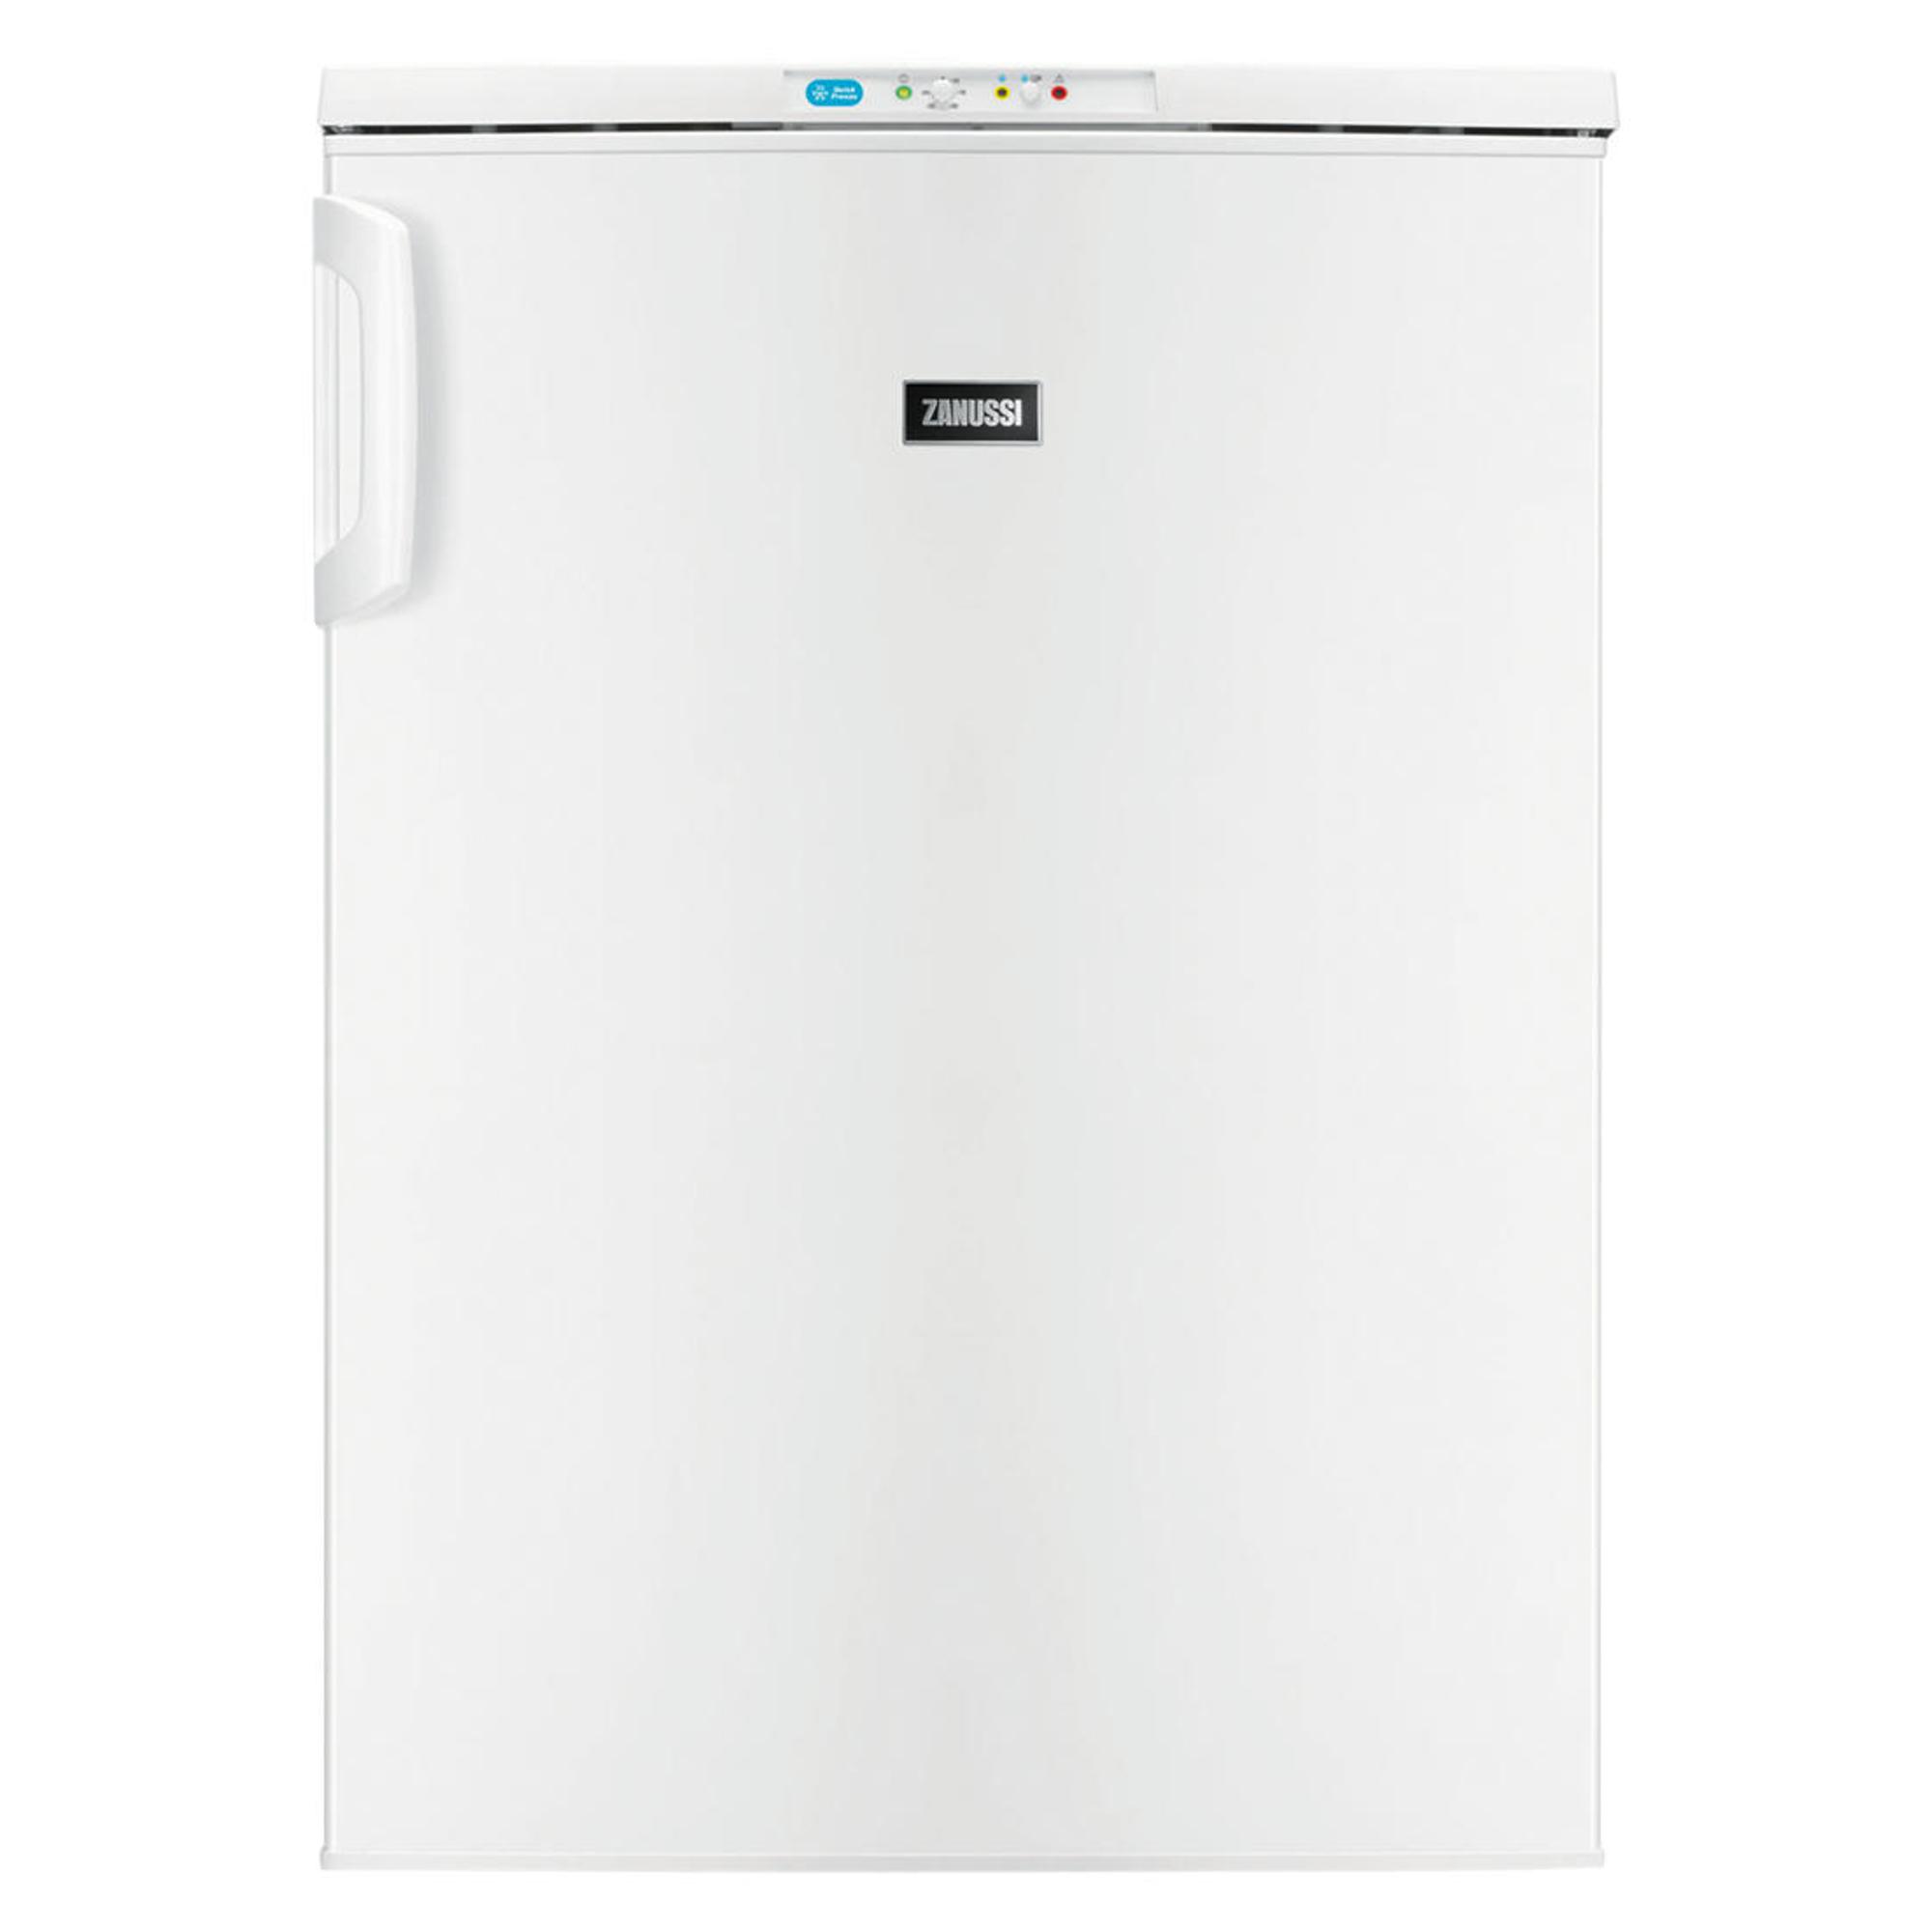 Zanussi Zft10210wv Frost Free 78l Under Counter Freezer